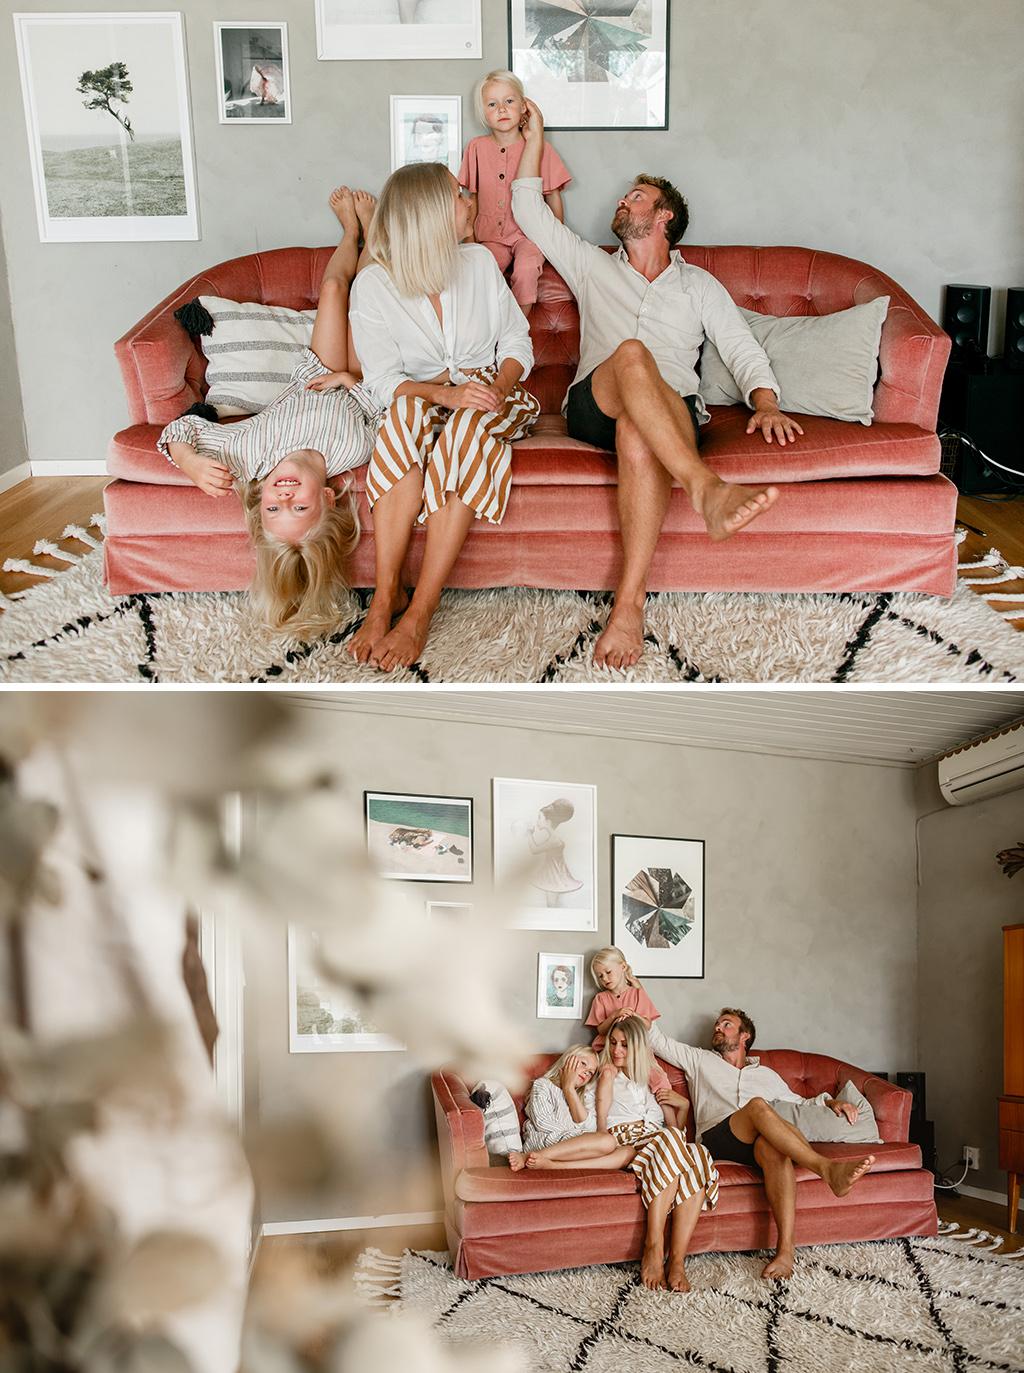 Lifestyle_familjefotografering_Stockholm_hemma-hos-fotografering_lifestyle-inhome-session_2.jpg